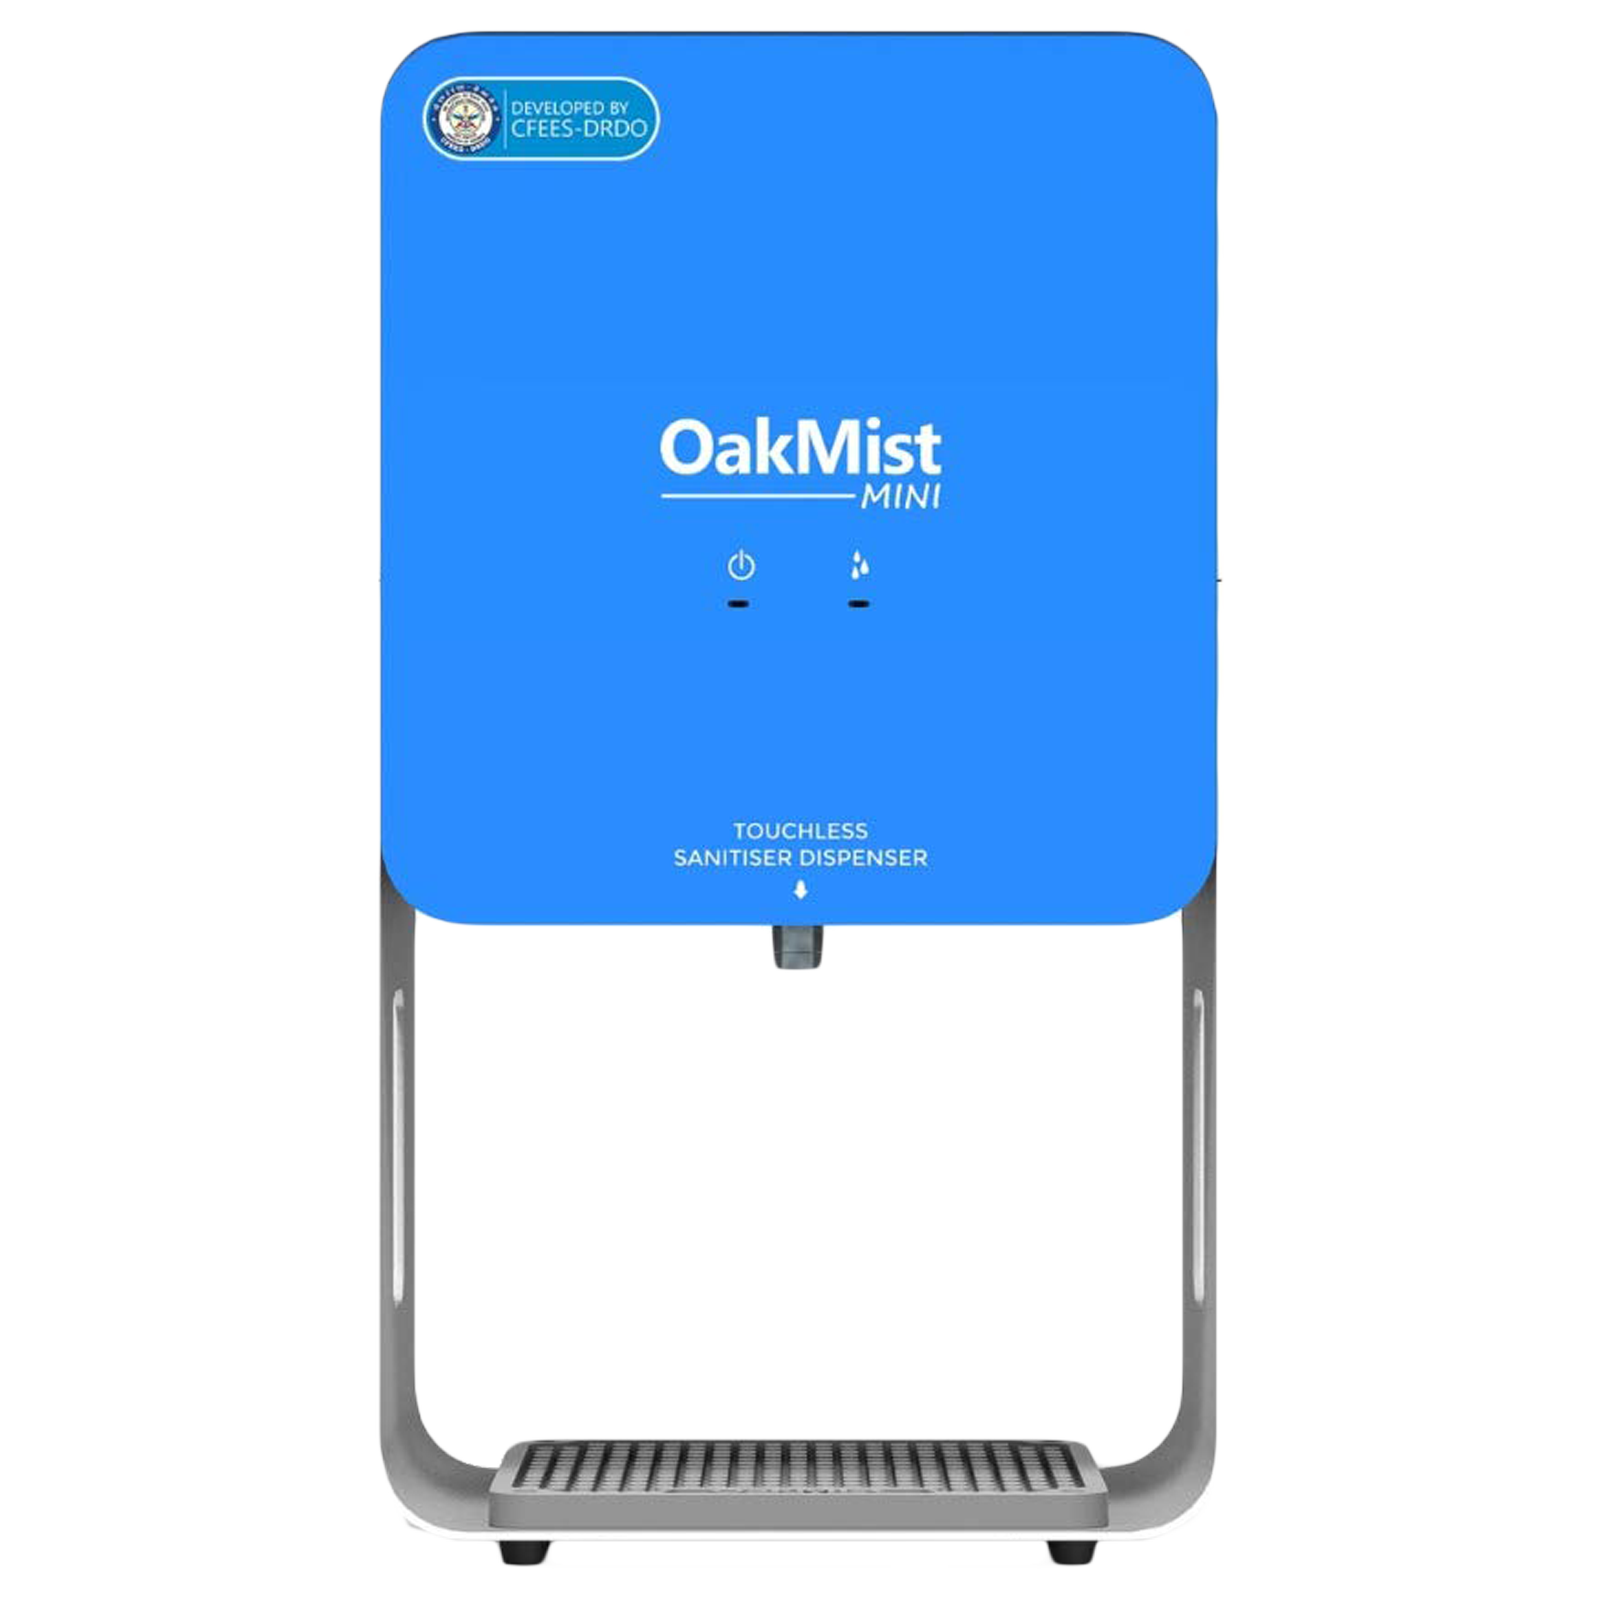 Oakmist Mini Automatic Sanitizer Dispenser (Touchless Sanitizer Dispenser, 95102, White)_1